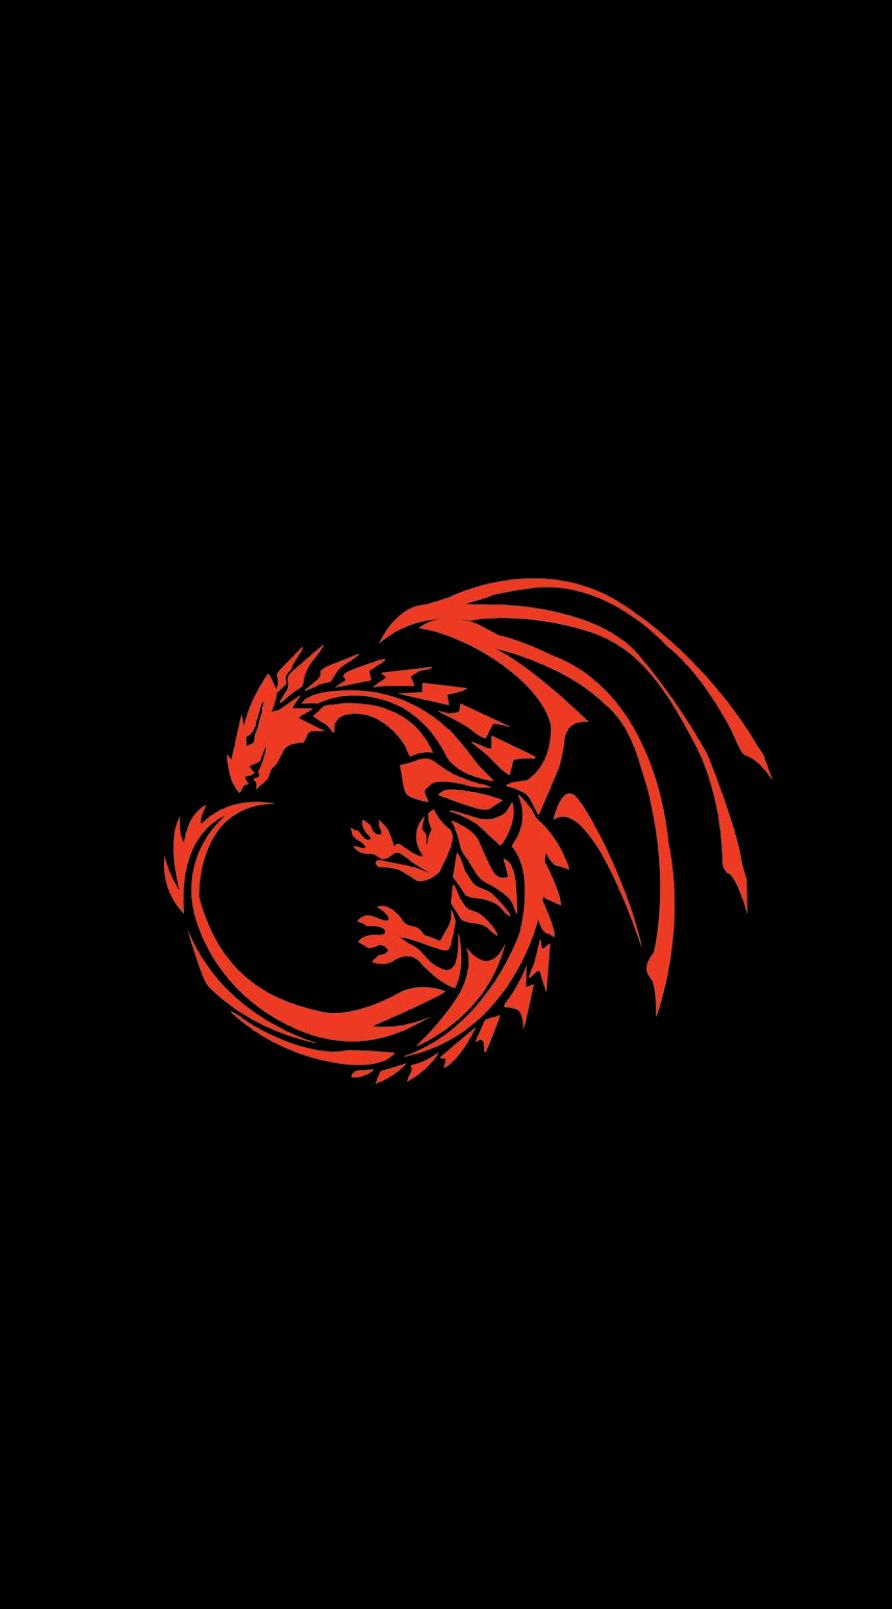 Обои background, tv series, daenerys targaryen, vintage, Game of thrones, minimalism, pinup models, Pinup, dragon, fantasy. Минимализм foto 4